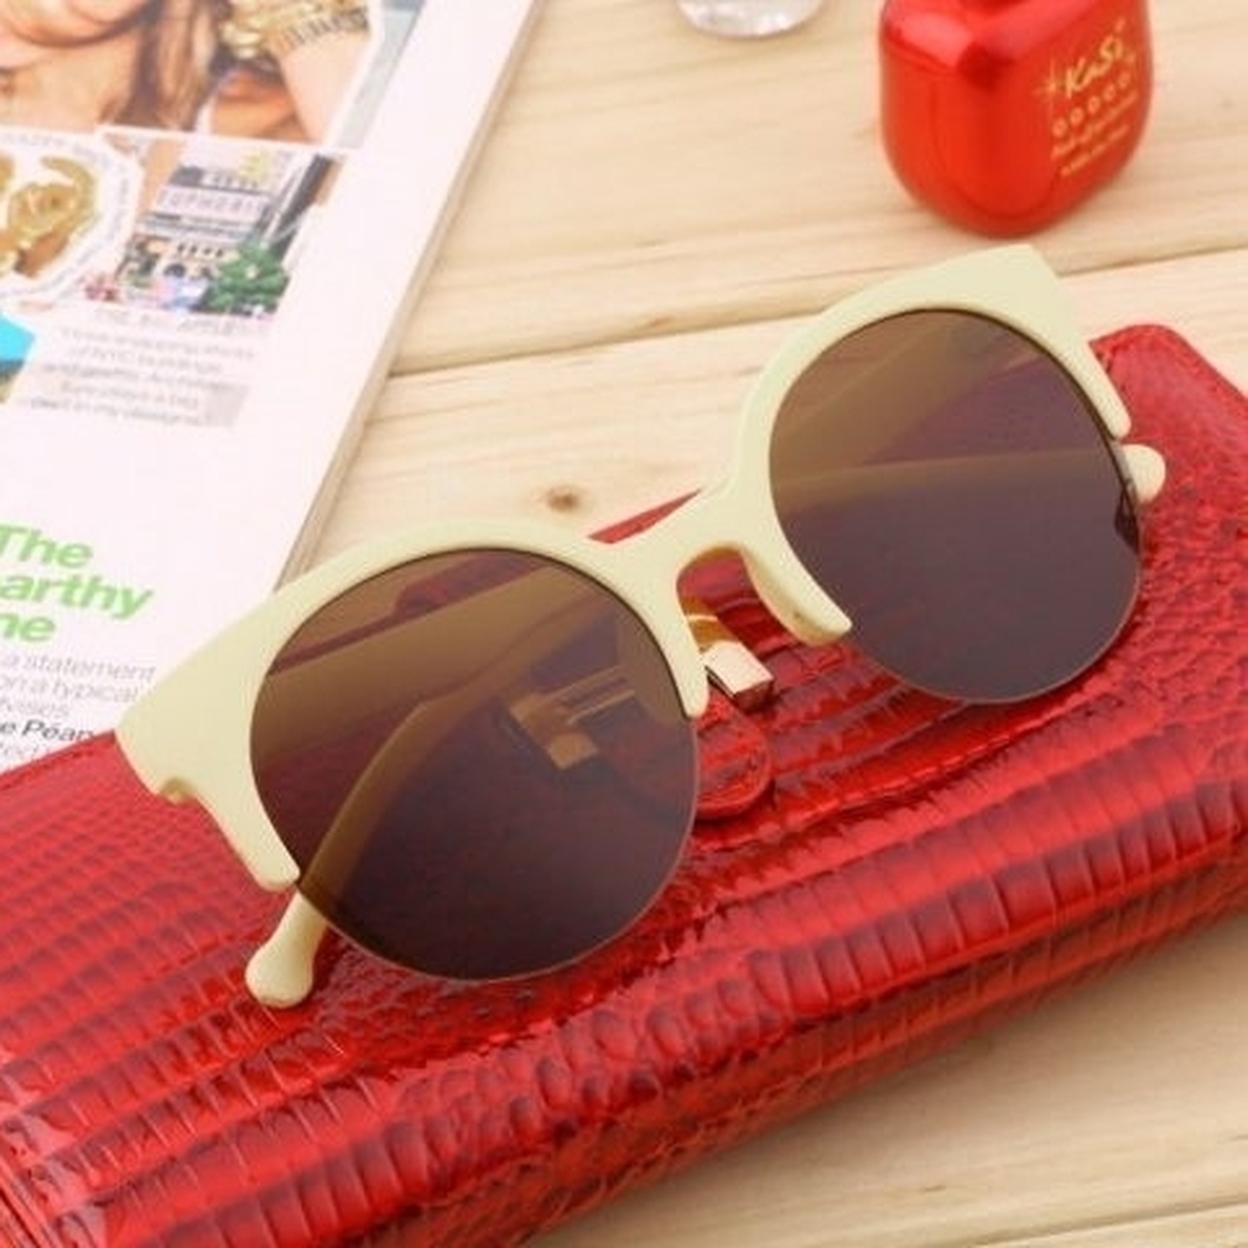 Unisex Round Frame Half Rim Sunglasses Glasses 59f5f4a32a00e42c6a044fe7